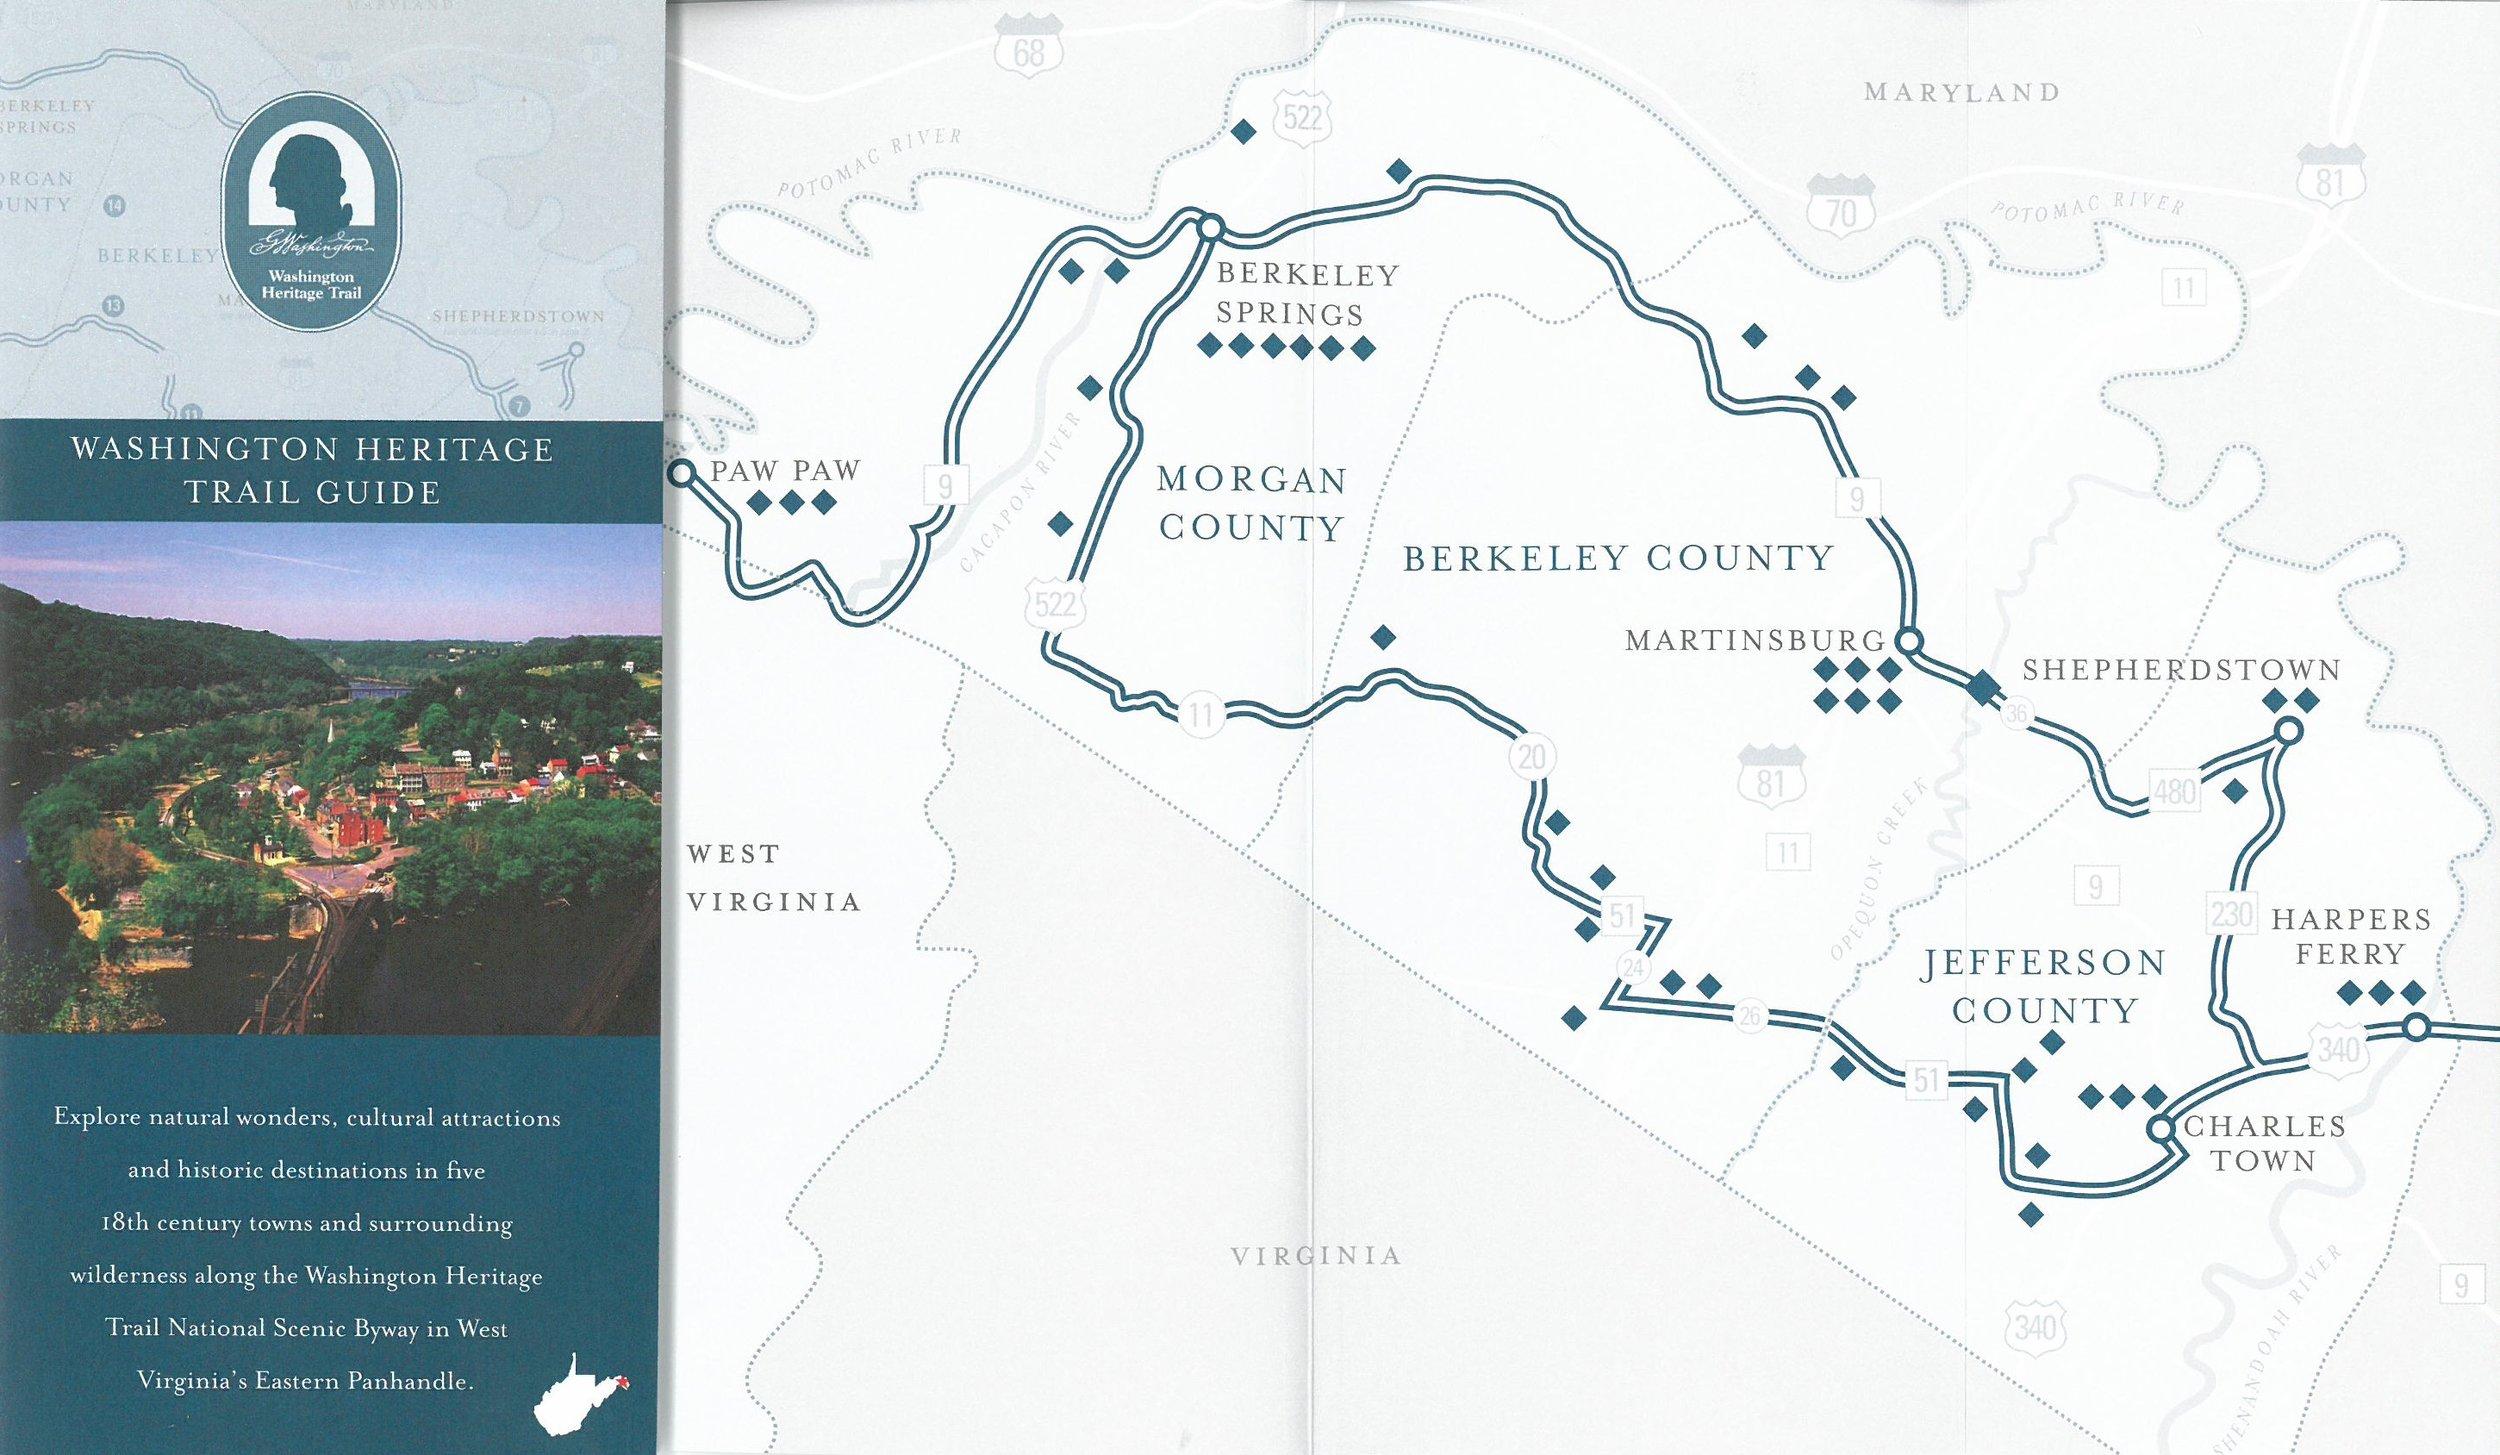 Washington Heritage trail map